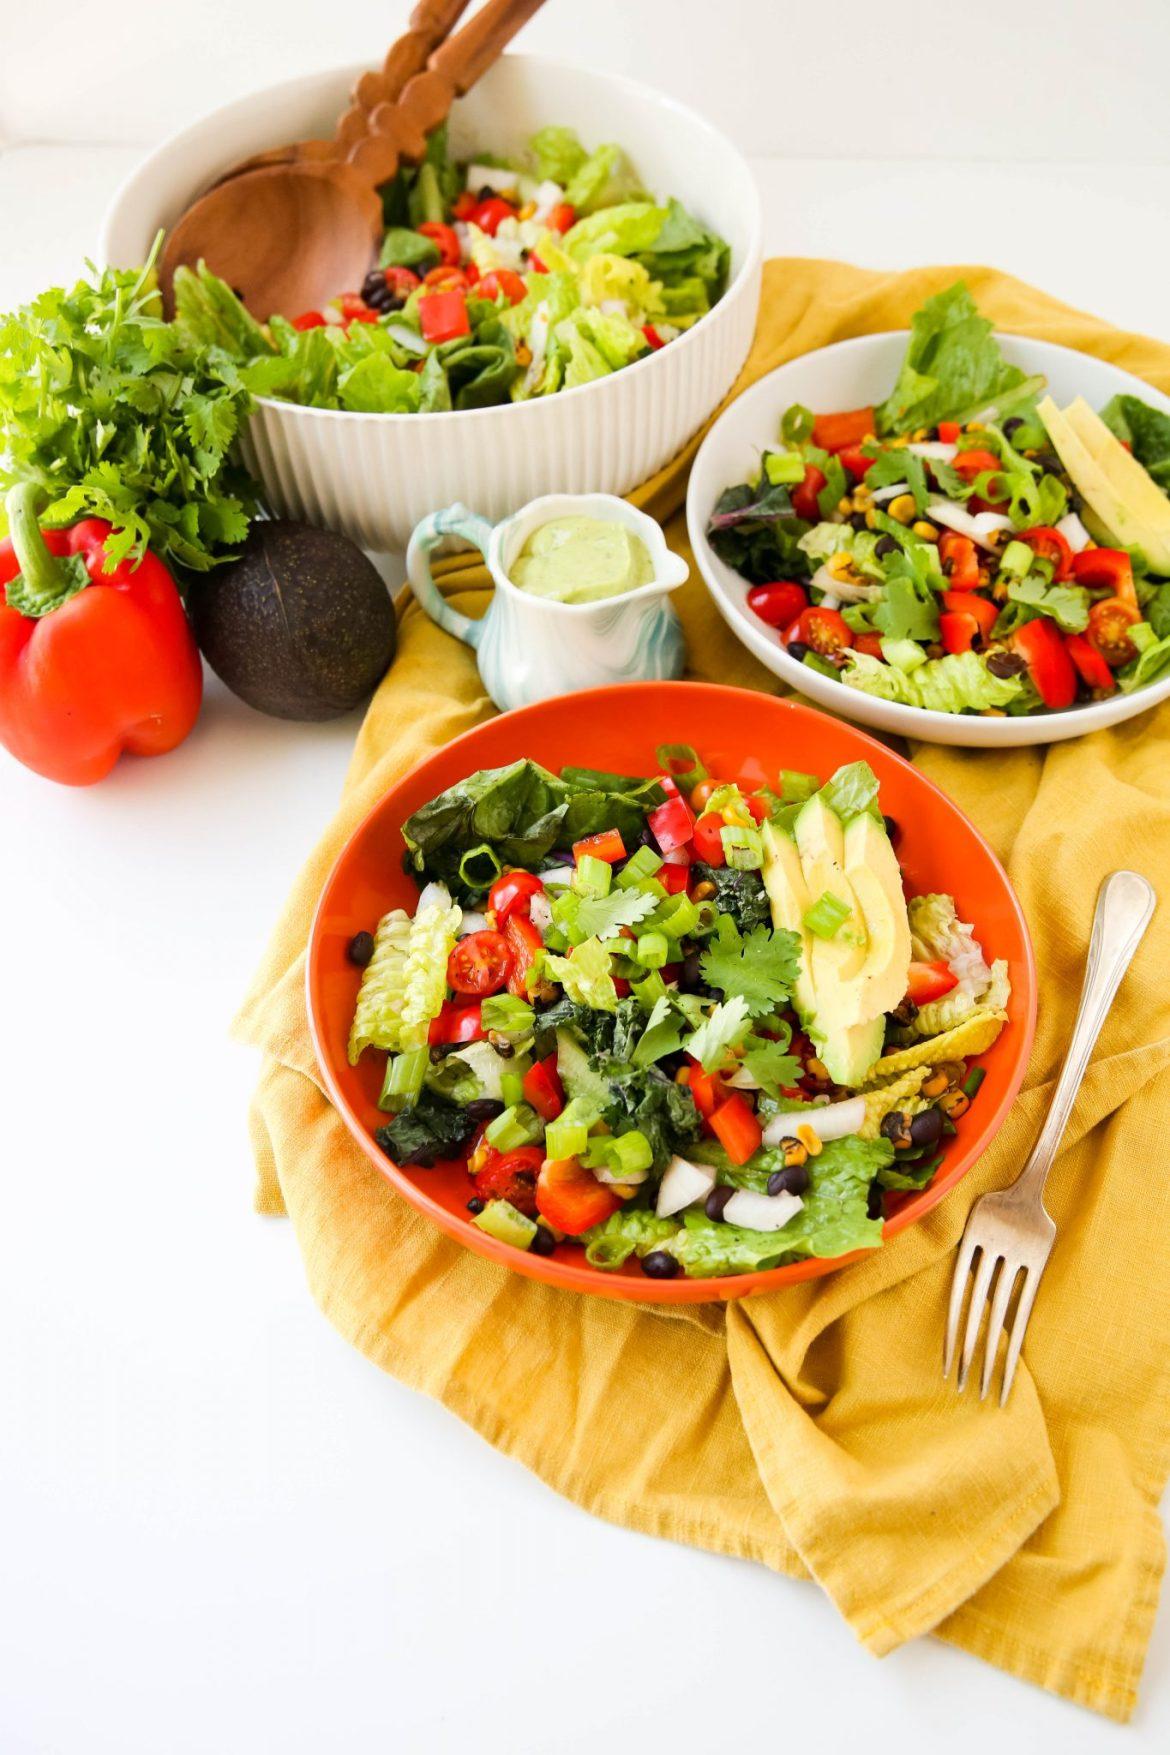 Southwestern chopped salad with cilantro dressing - Dr. Pingel